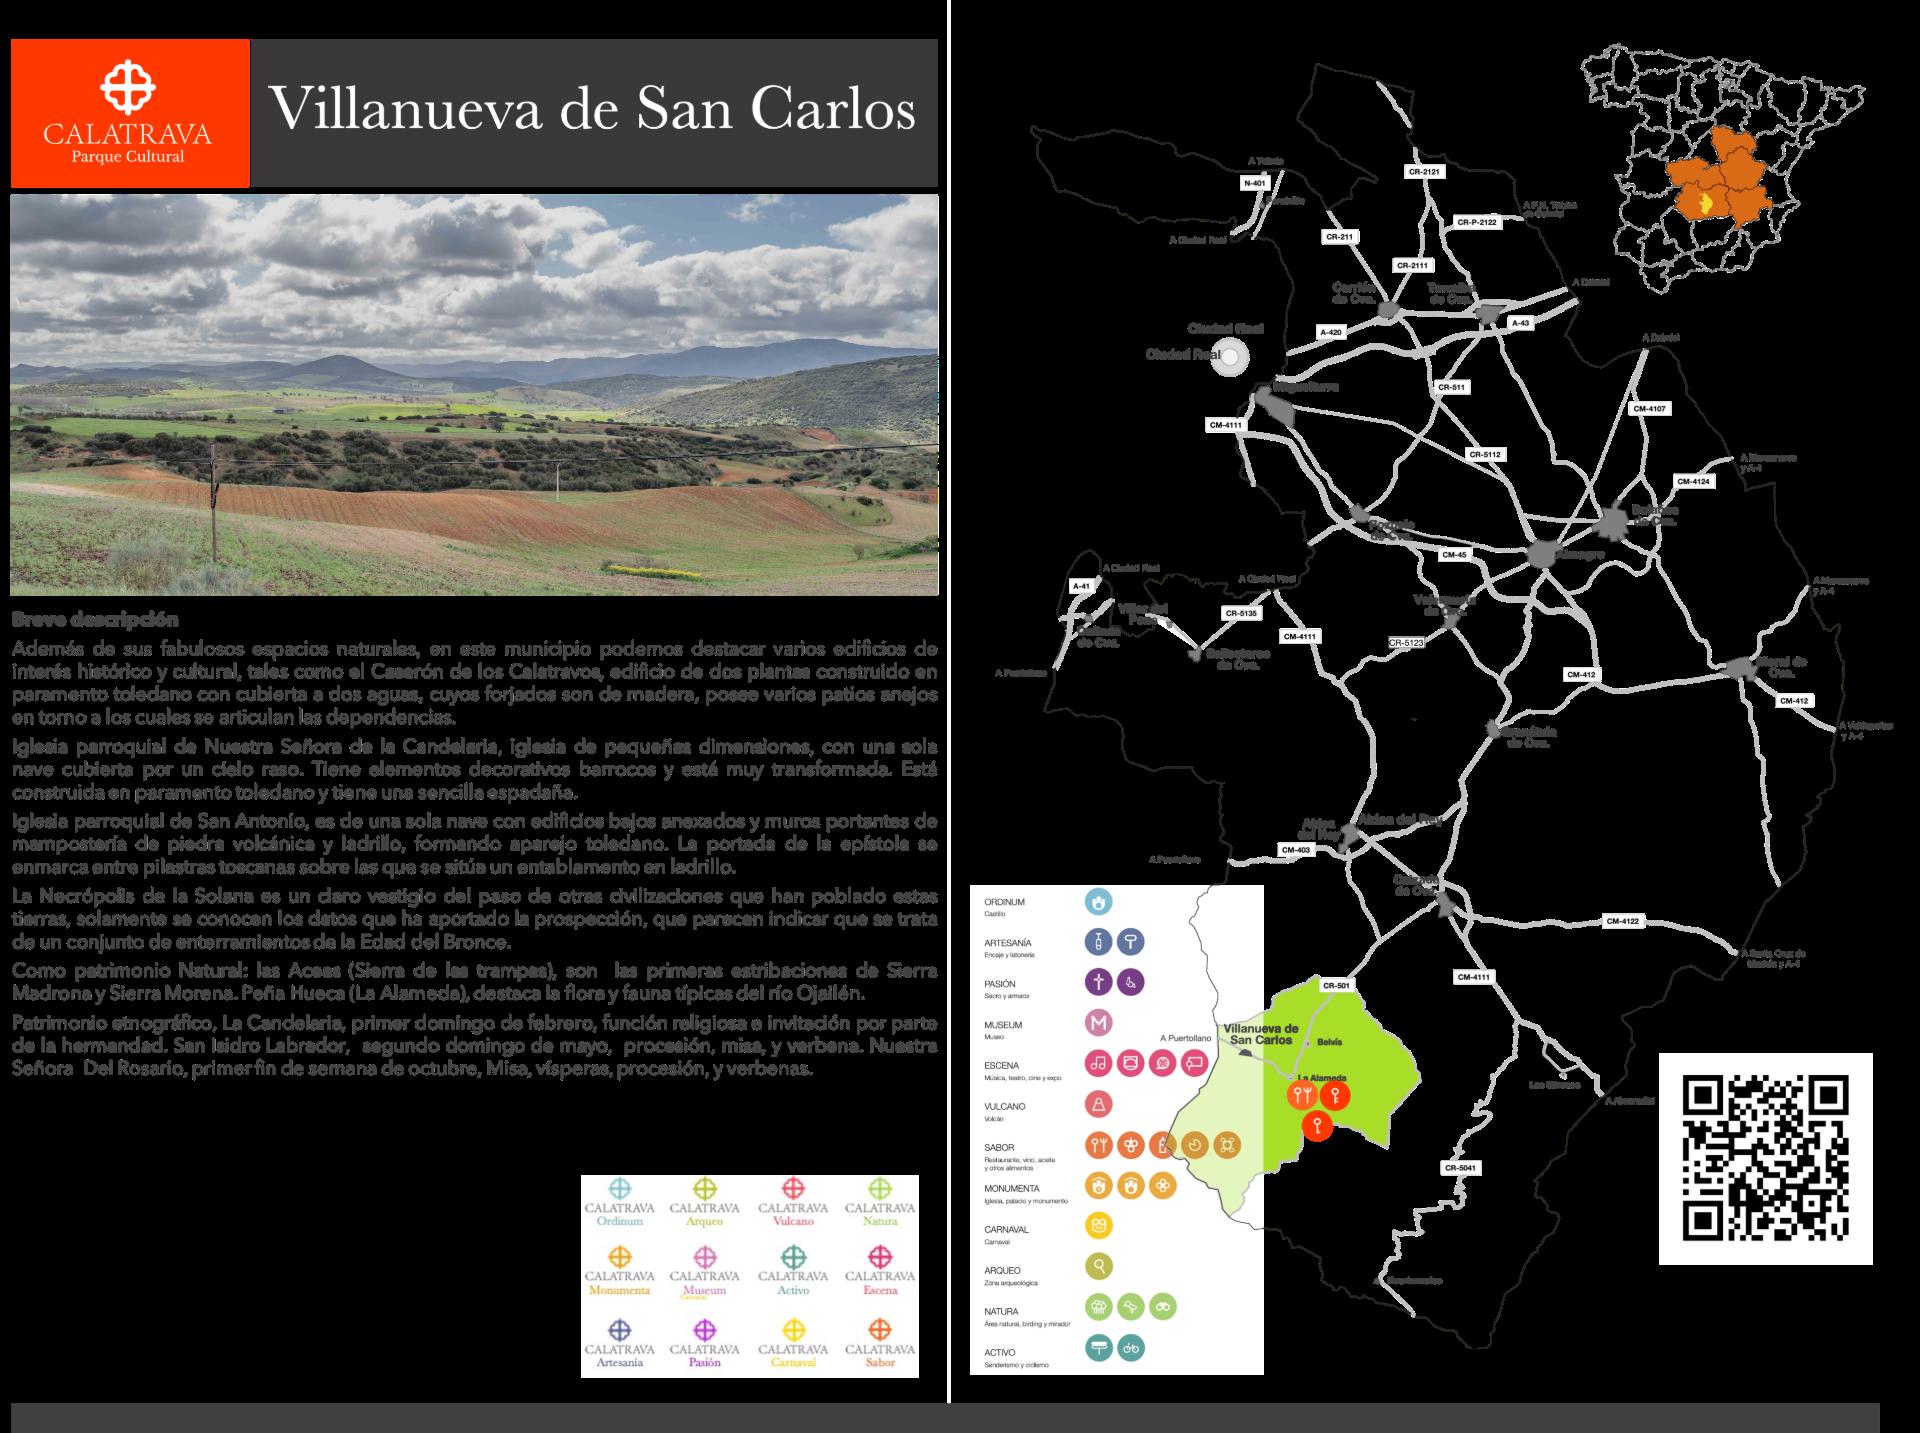 mapa-Villanueva de San Carlos